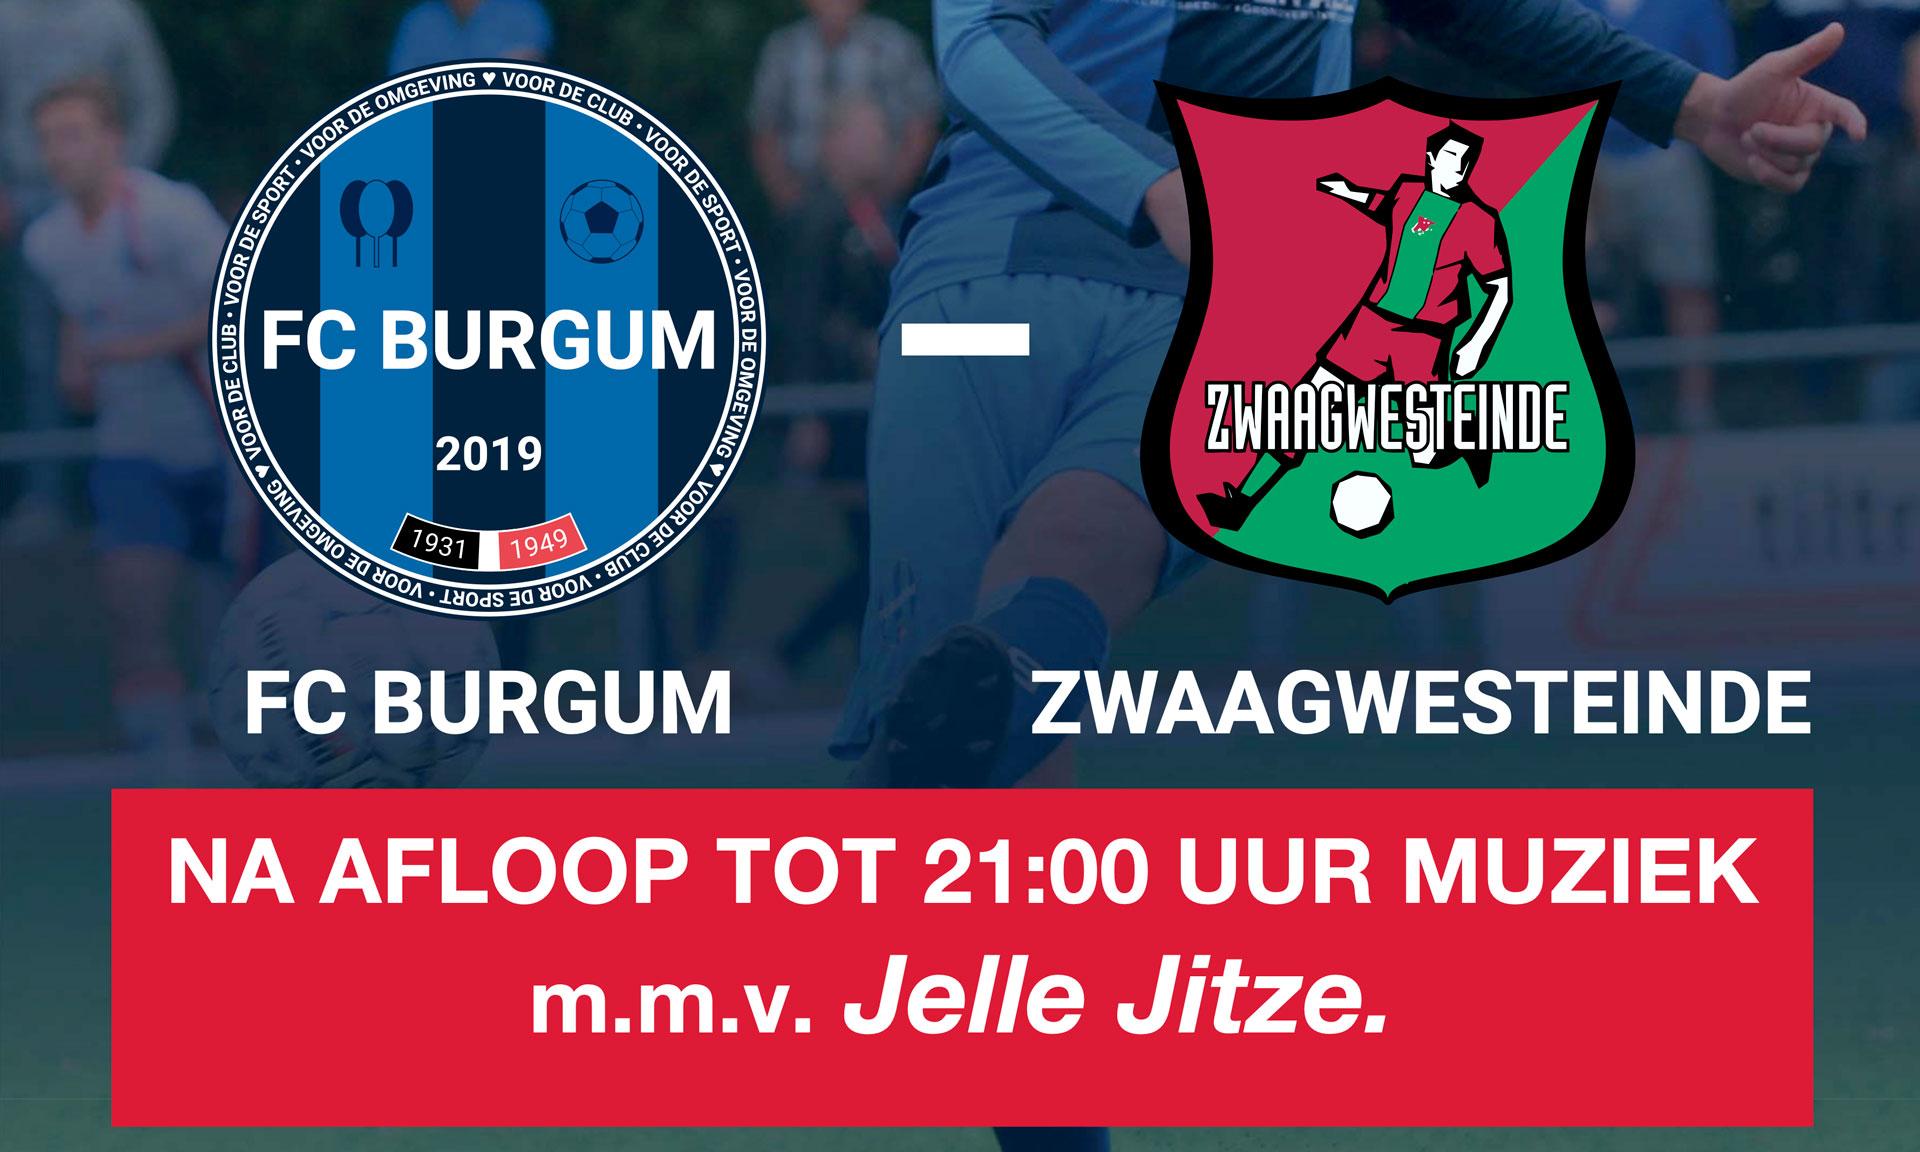 Zaterdag 23 november FC Burgum - VV Zwaagwesteinde met na afloop live muziek van Jelle Jitze